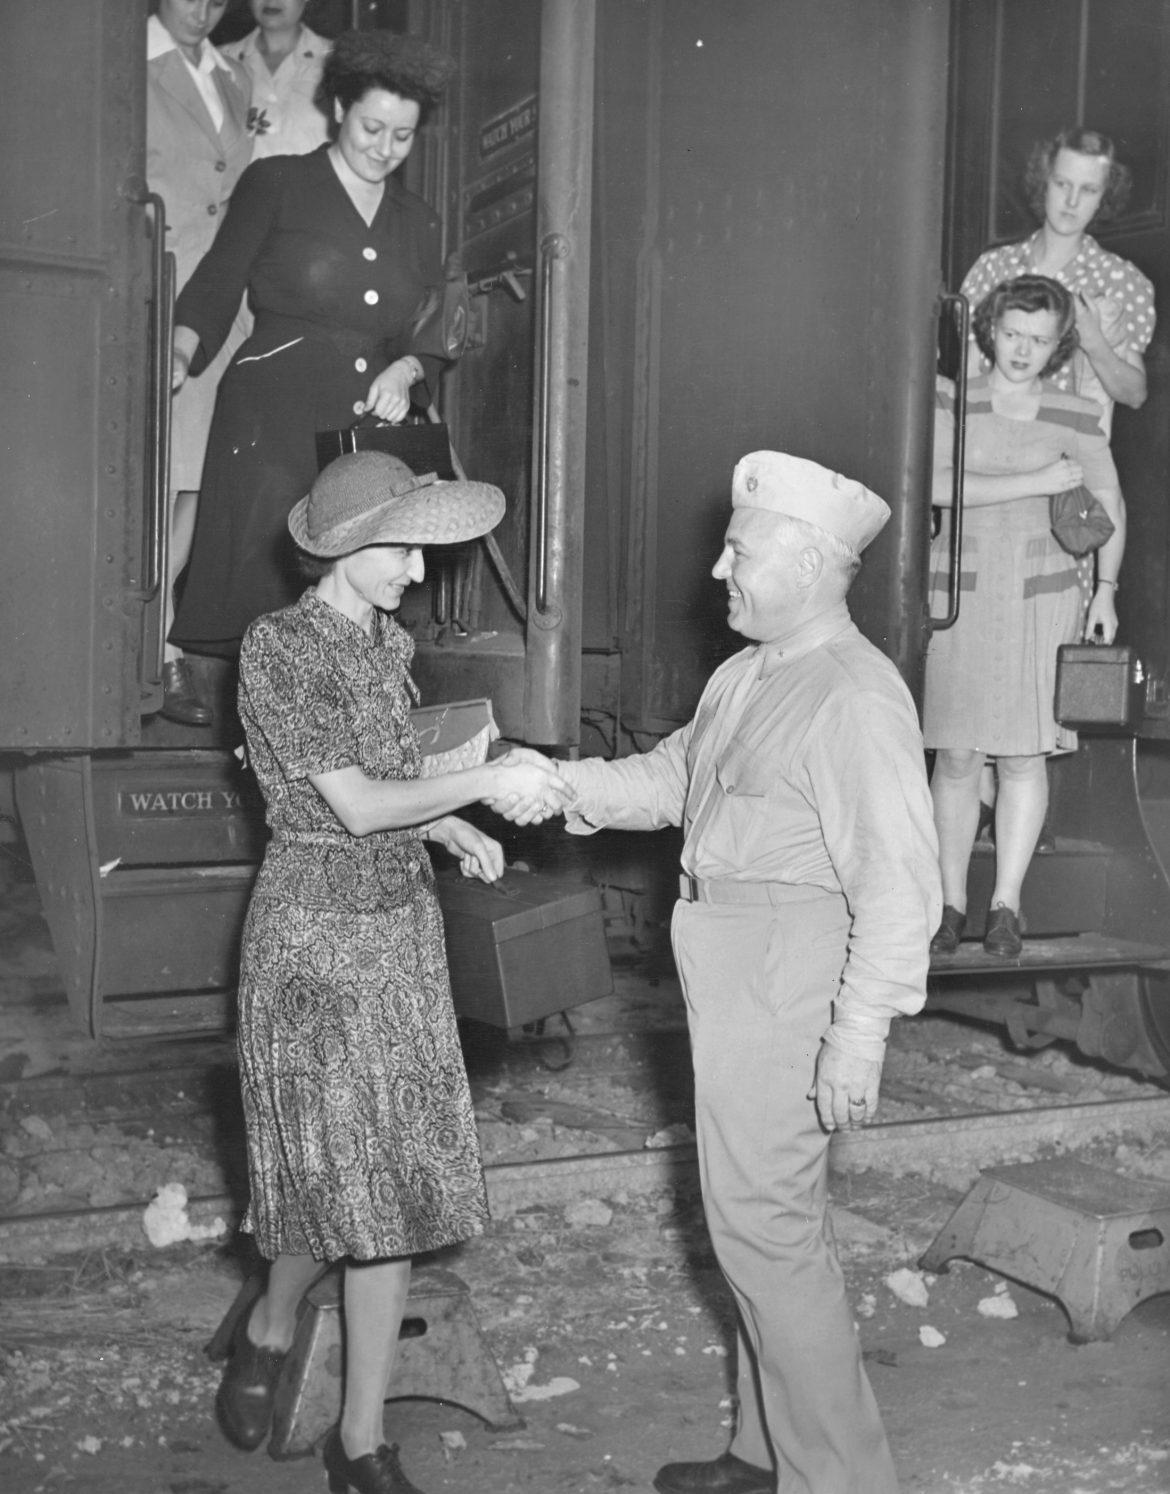 Woman Marine Recruits Arrive on Troop Train